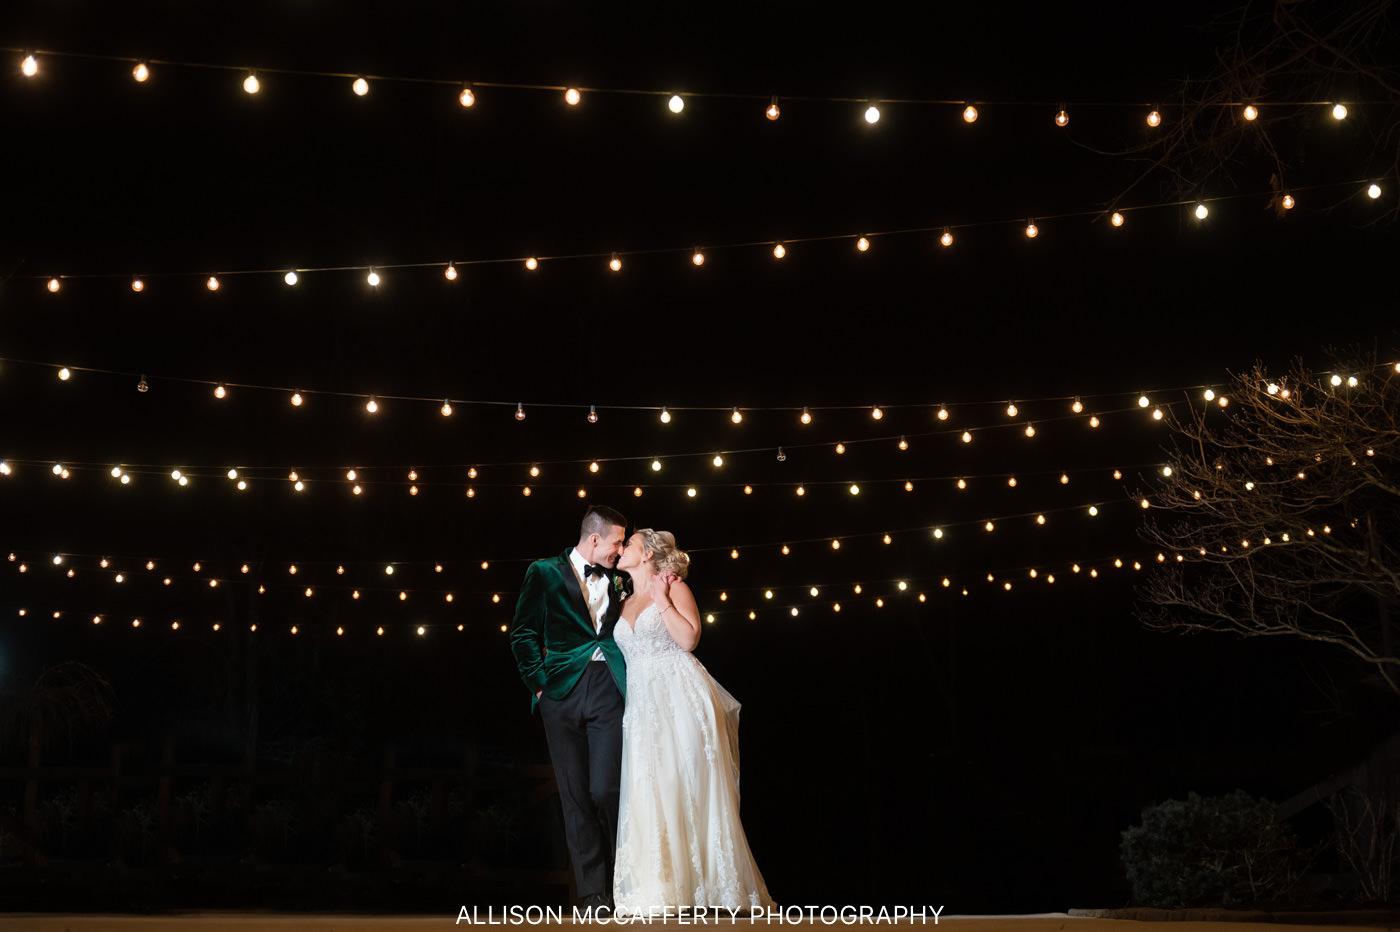 Wedding Photo Done Under String Lights at Hamilton Manor